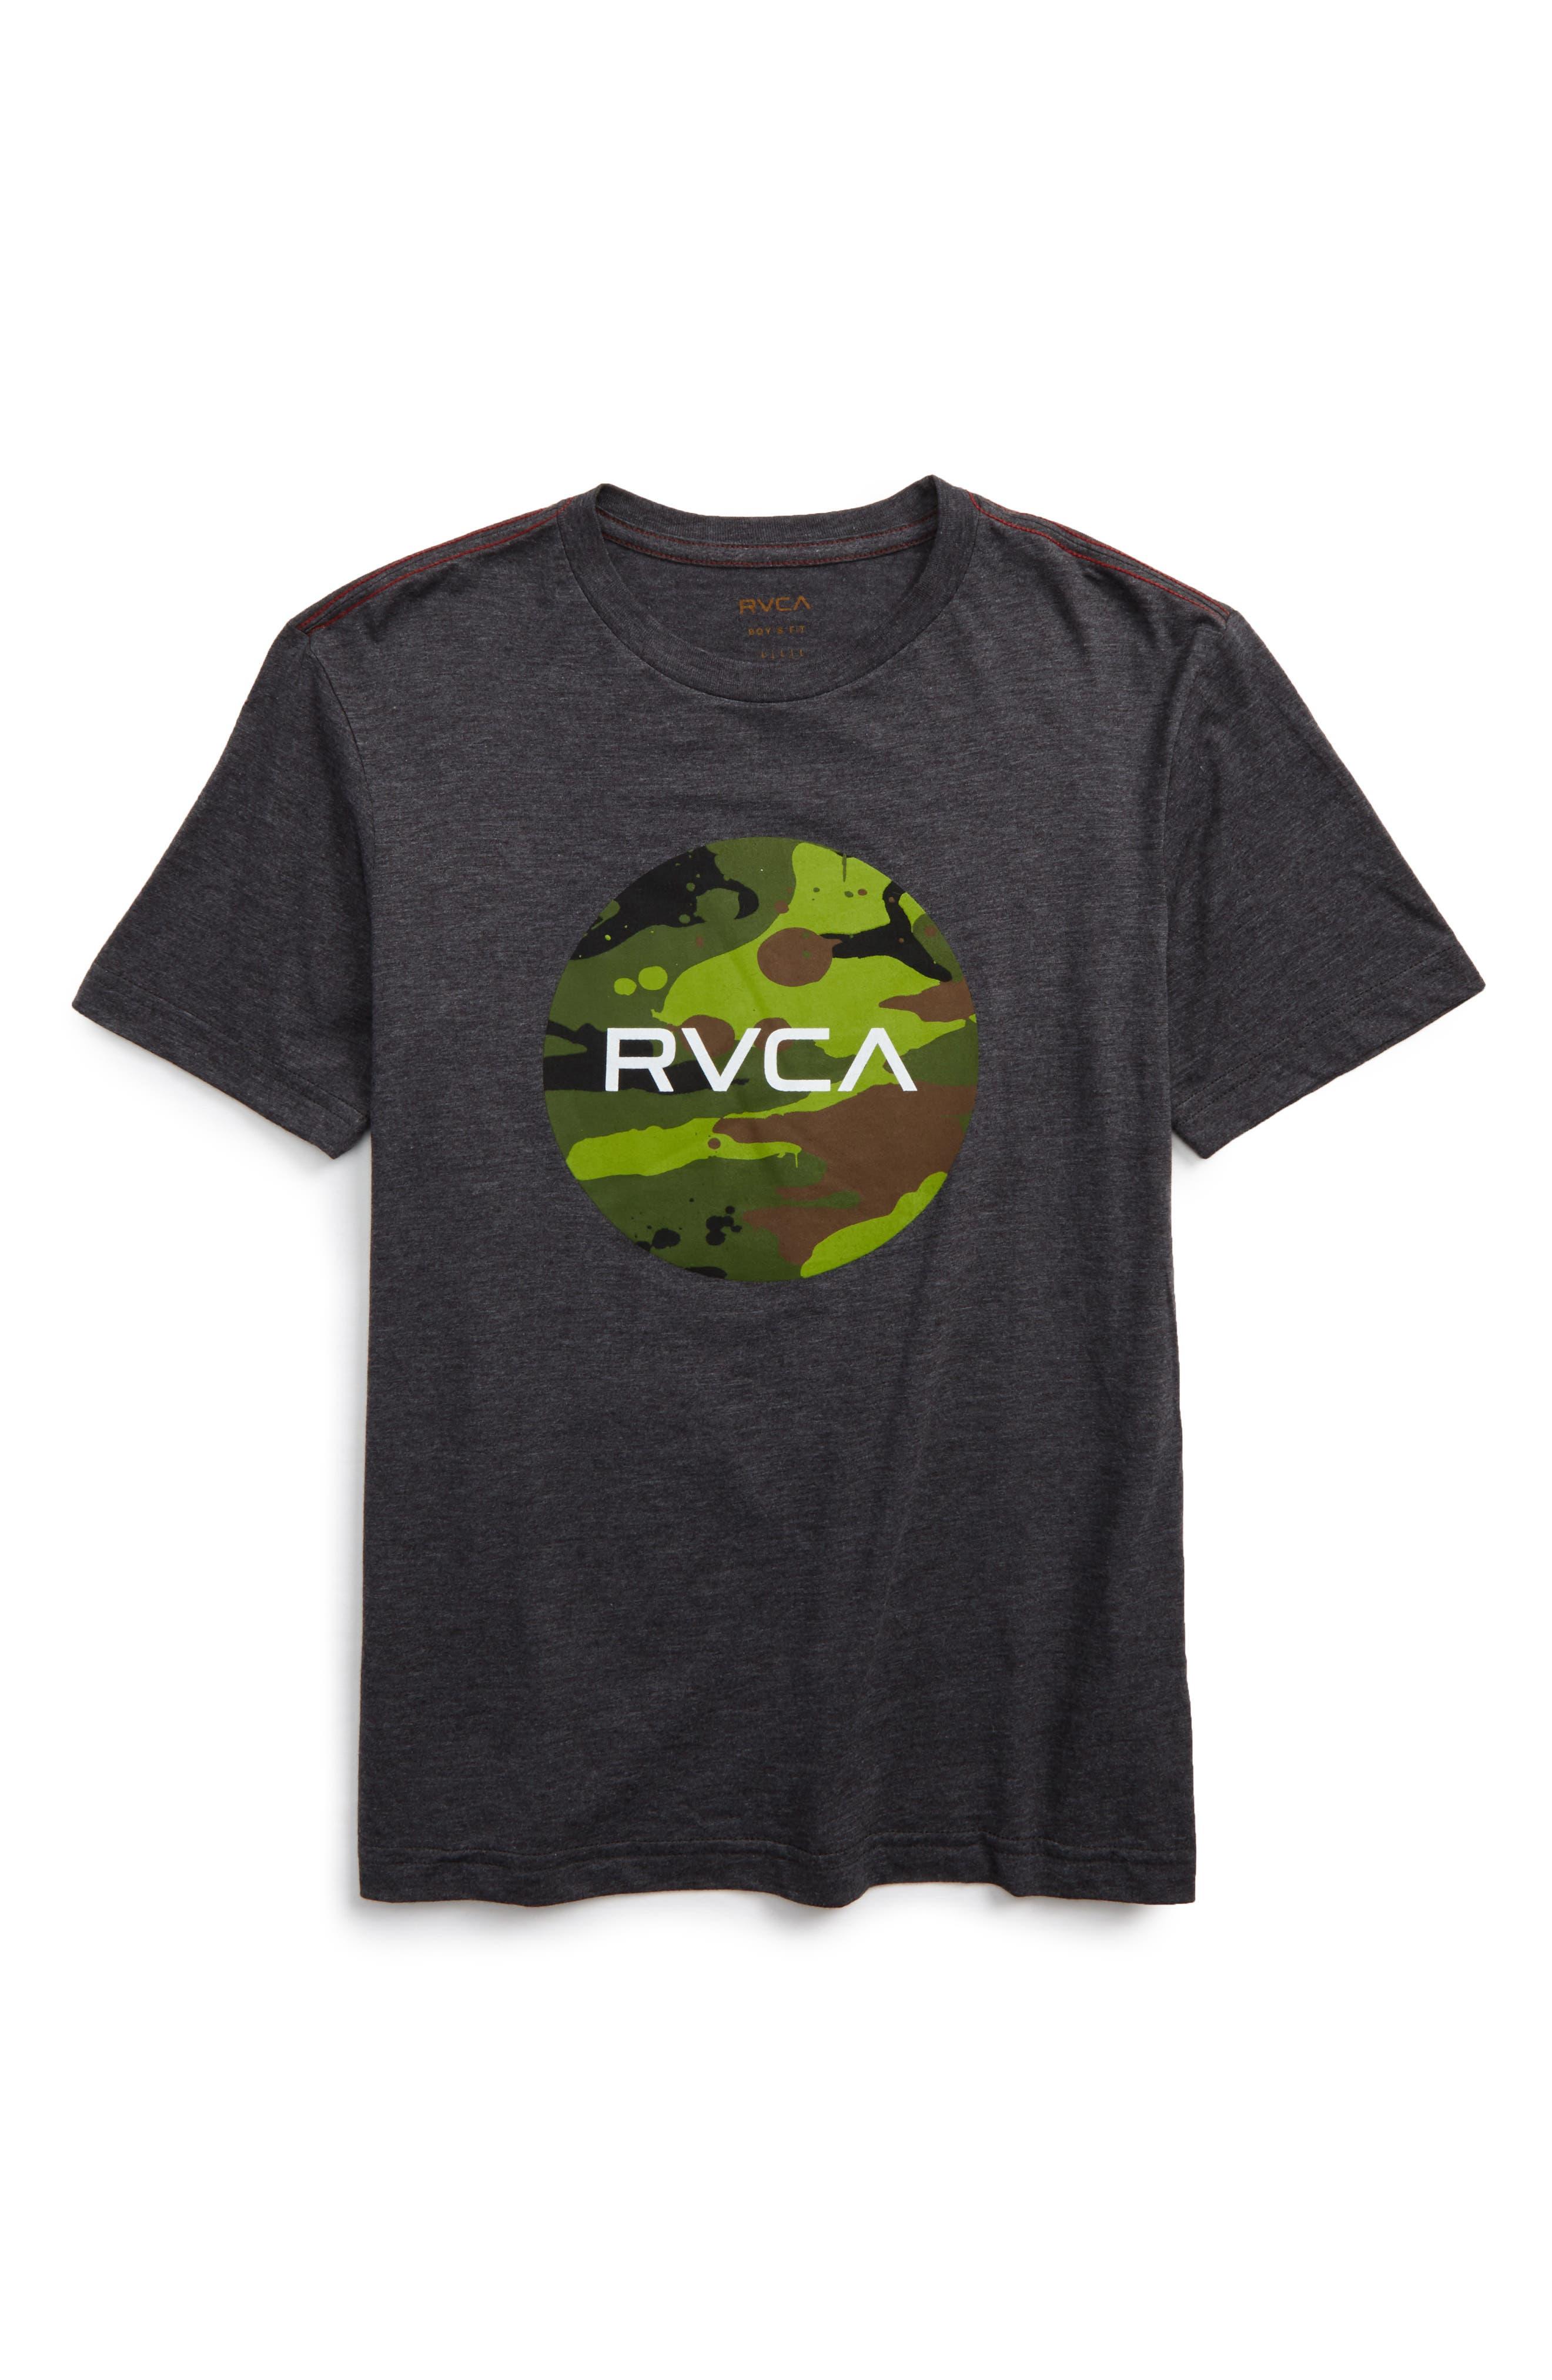 RVCA Stash Motors Graphic T-Shirt (Big Boys)